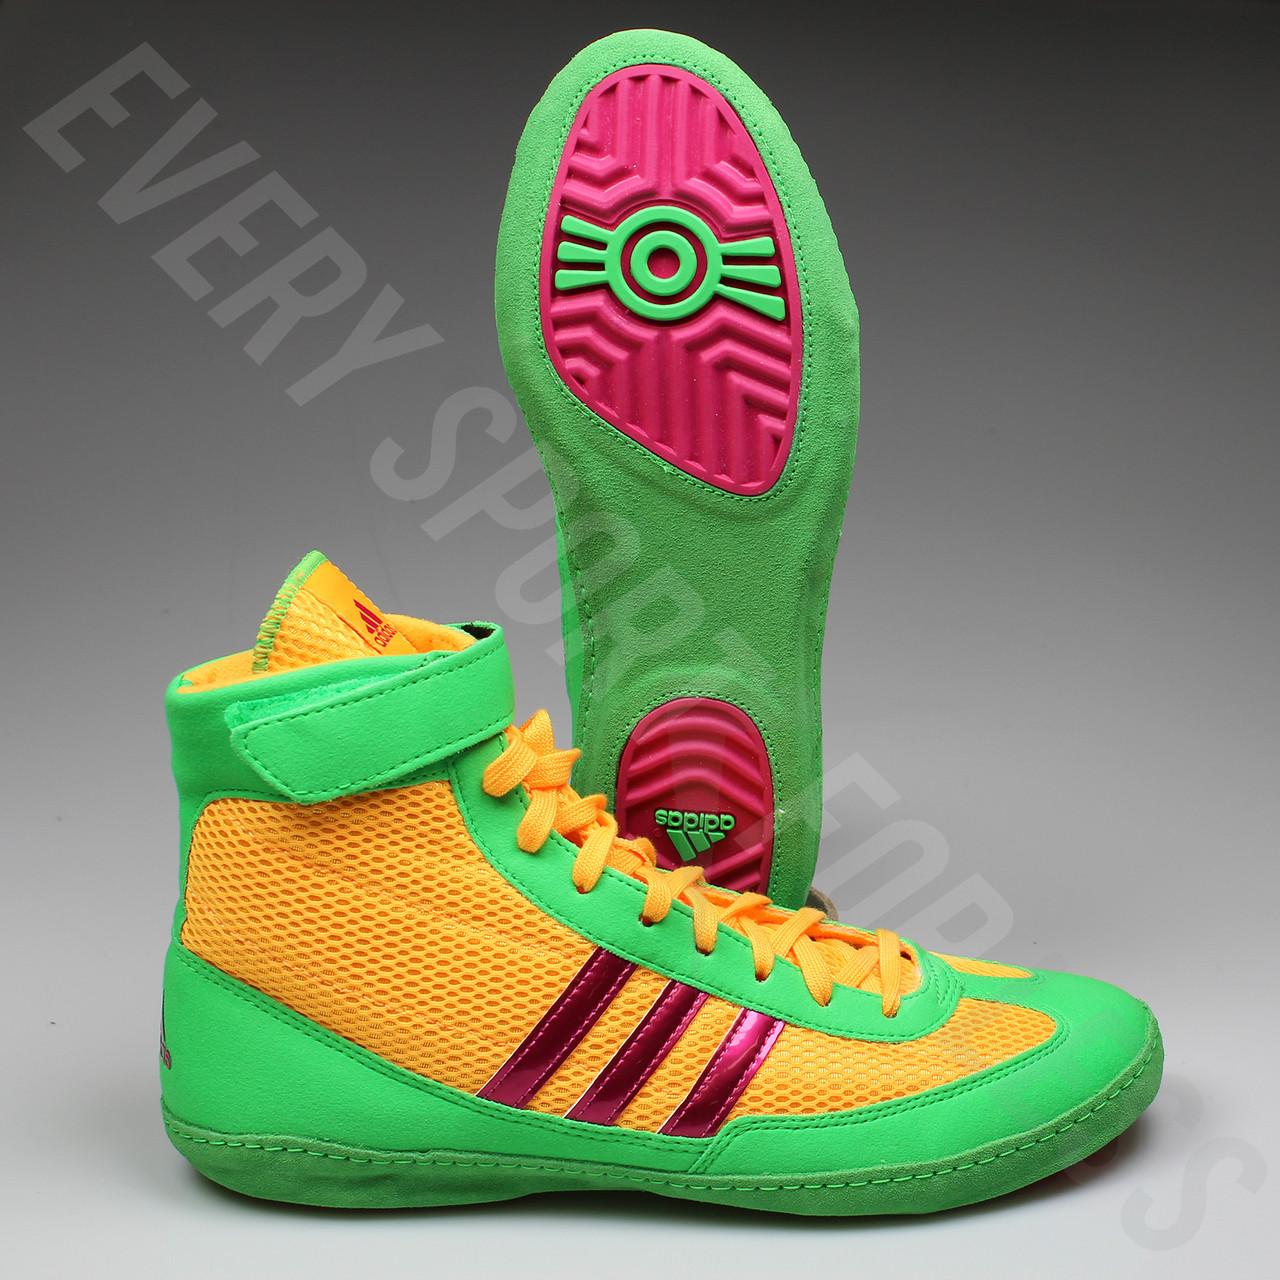 ... australia adidas combat speed 4 wrestling shoes aq3059 gold pink lime  d854d d9a18 b1f1dd176